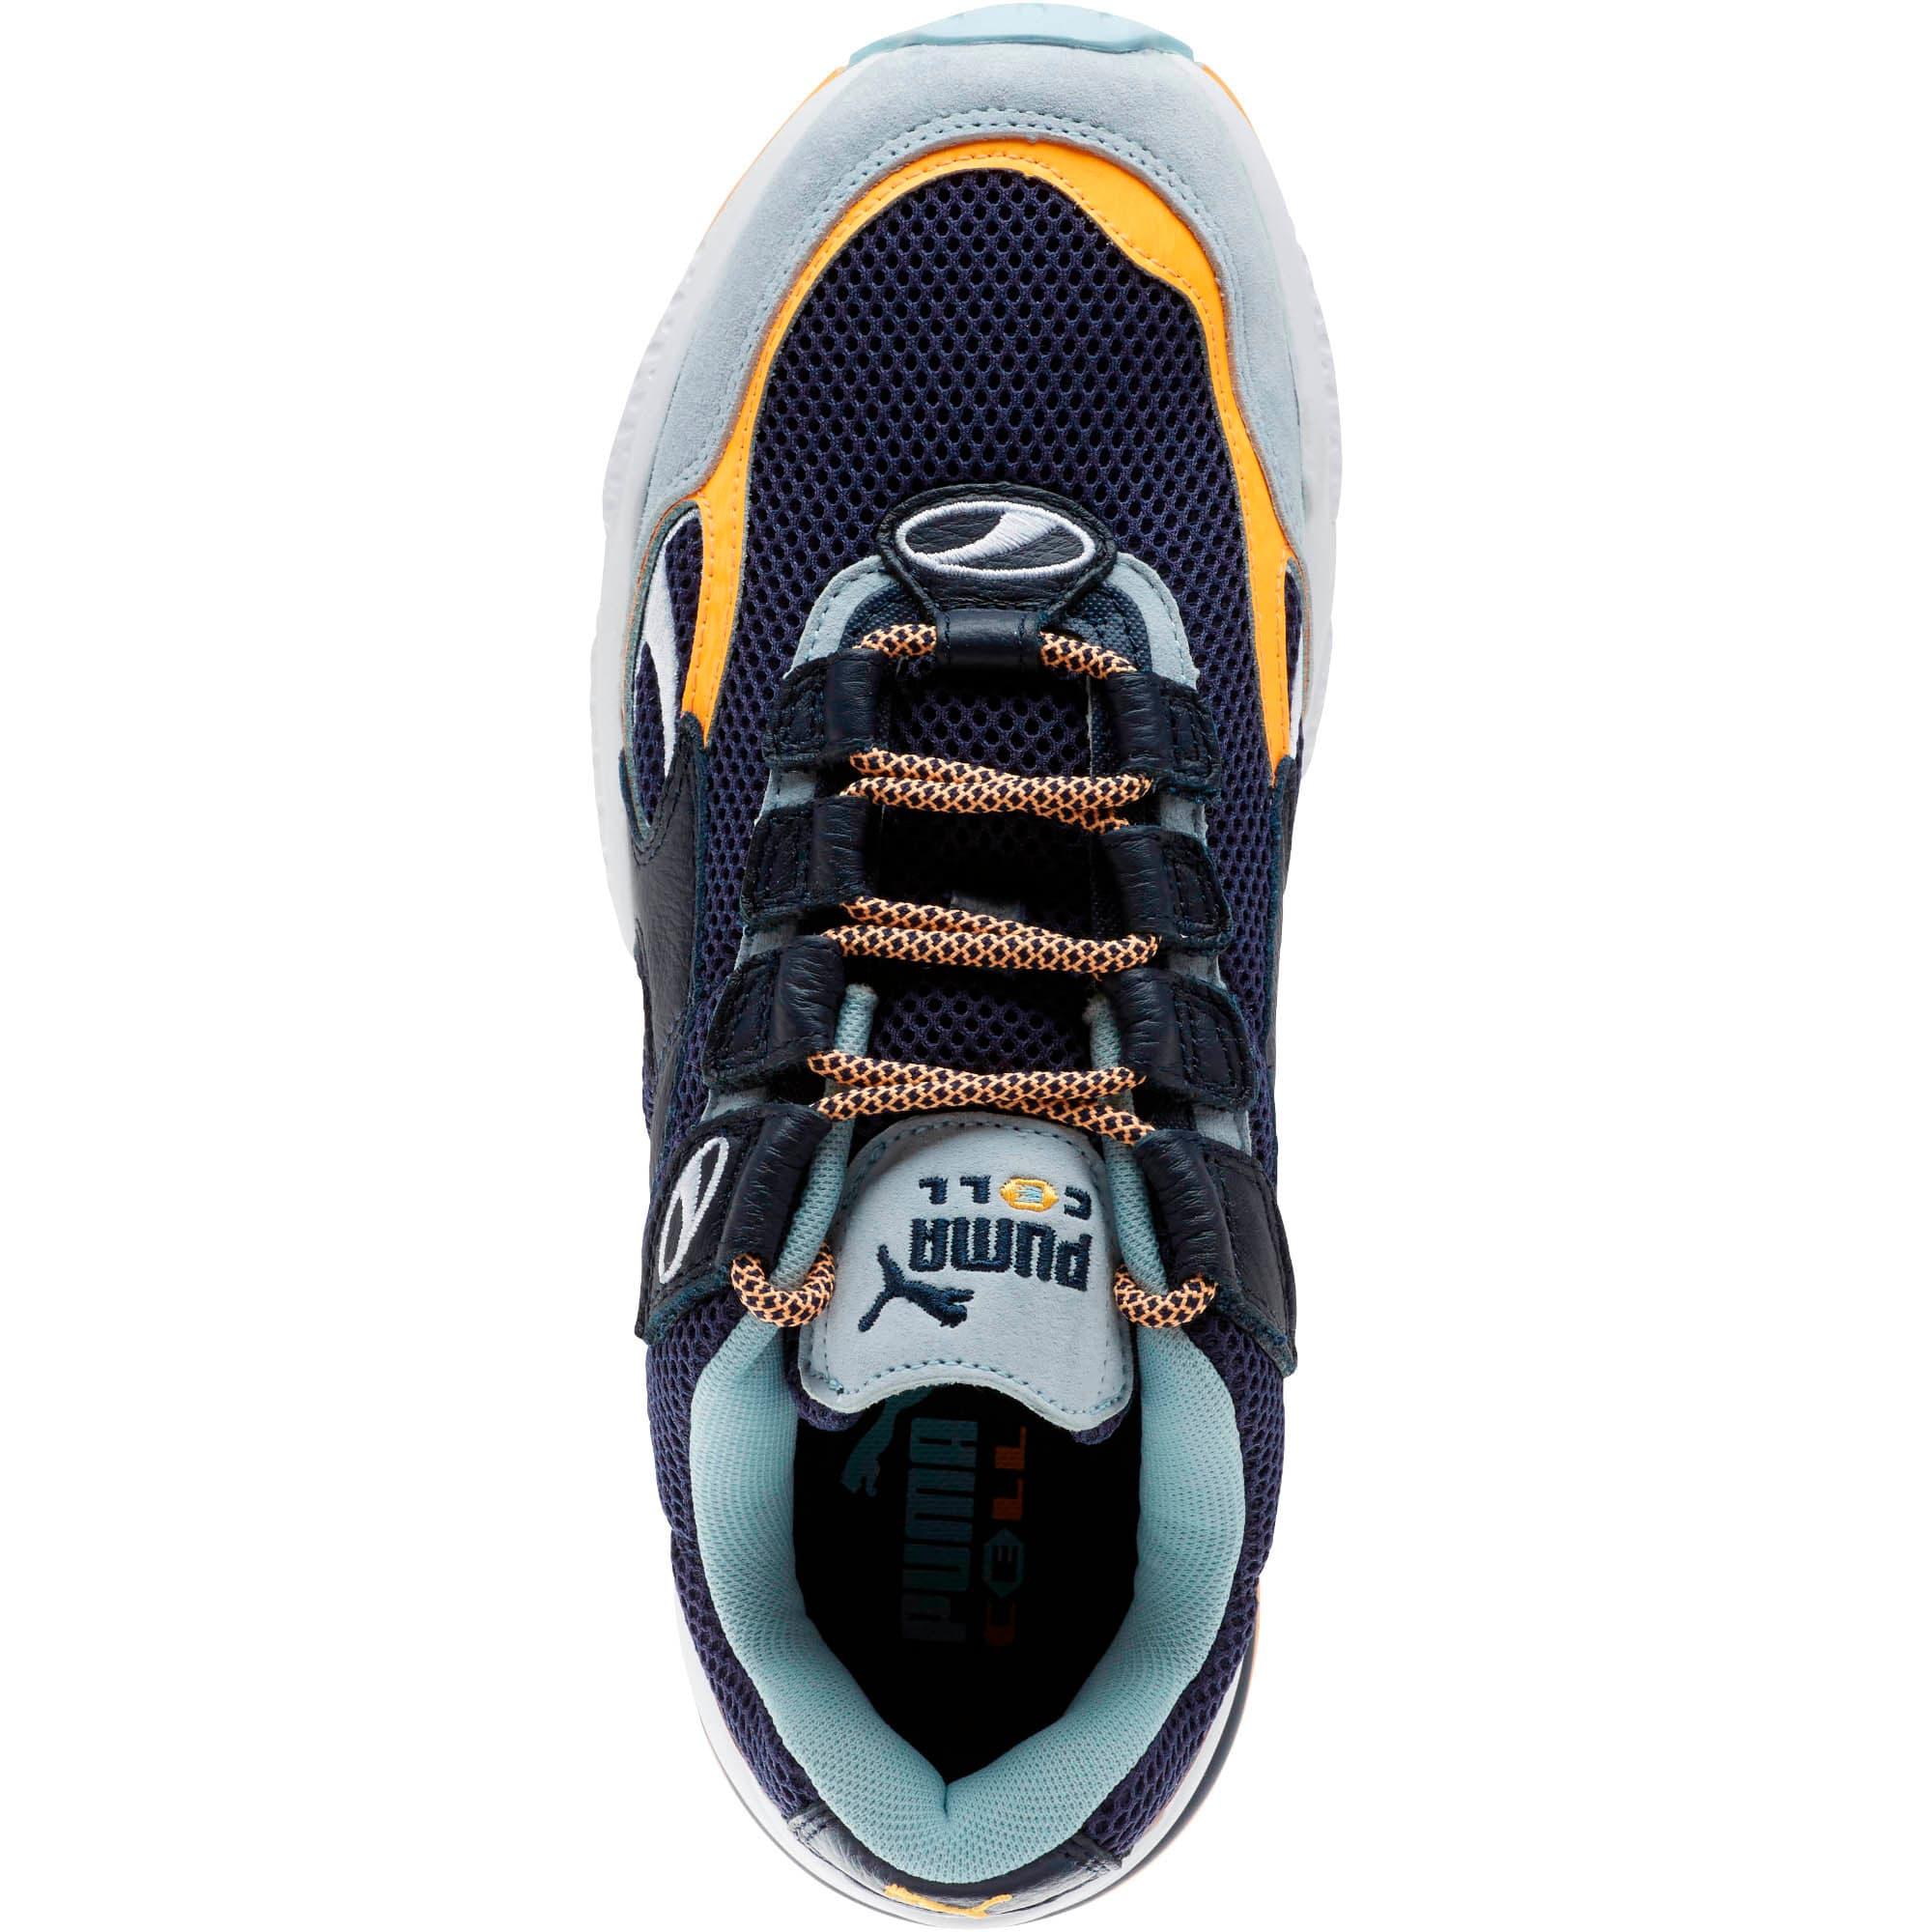 Thumbnail 5 of CELL Venom Sportswear Sneakers, Peacoat-Light Sky, medium